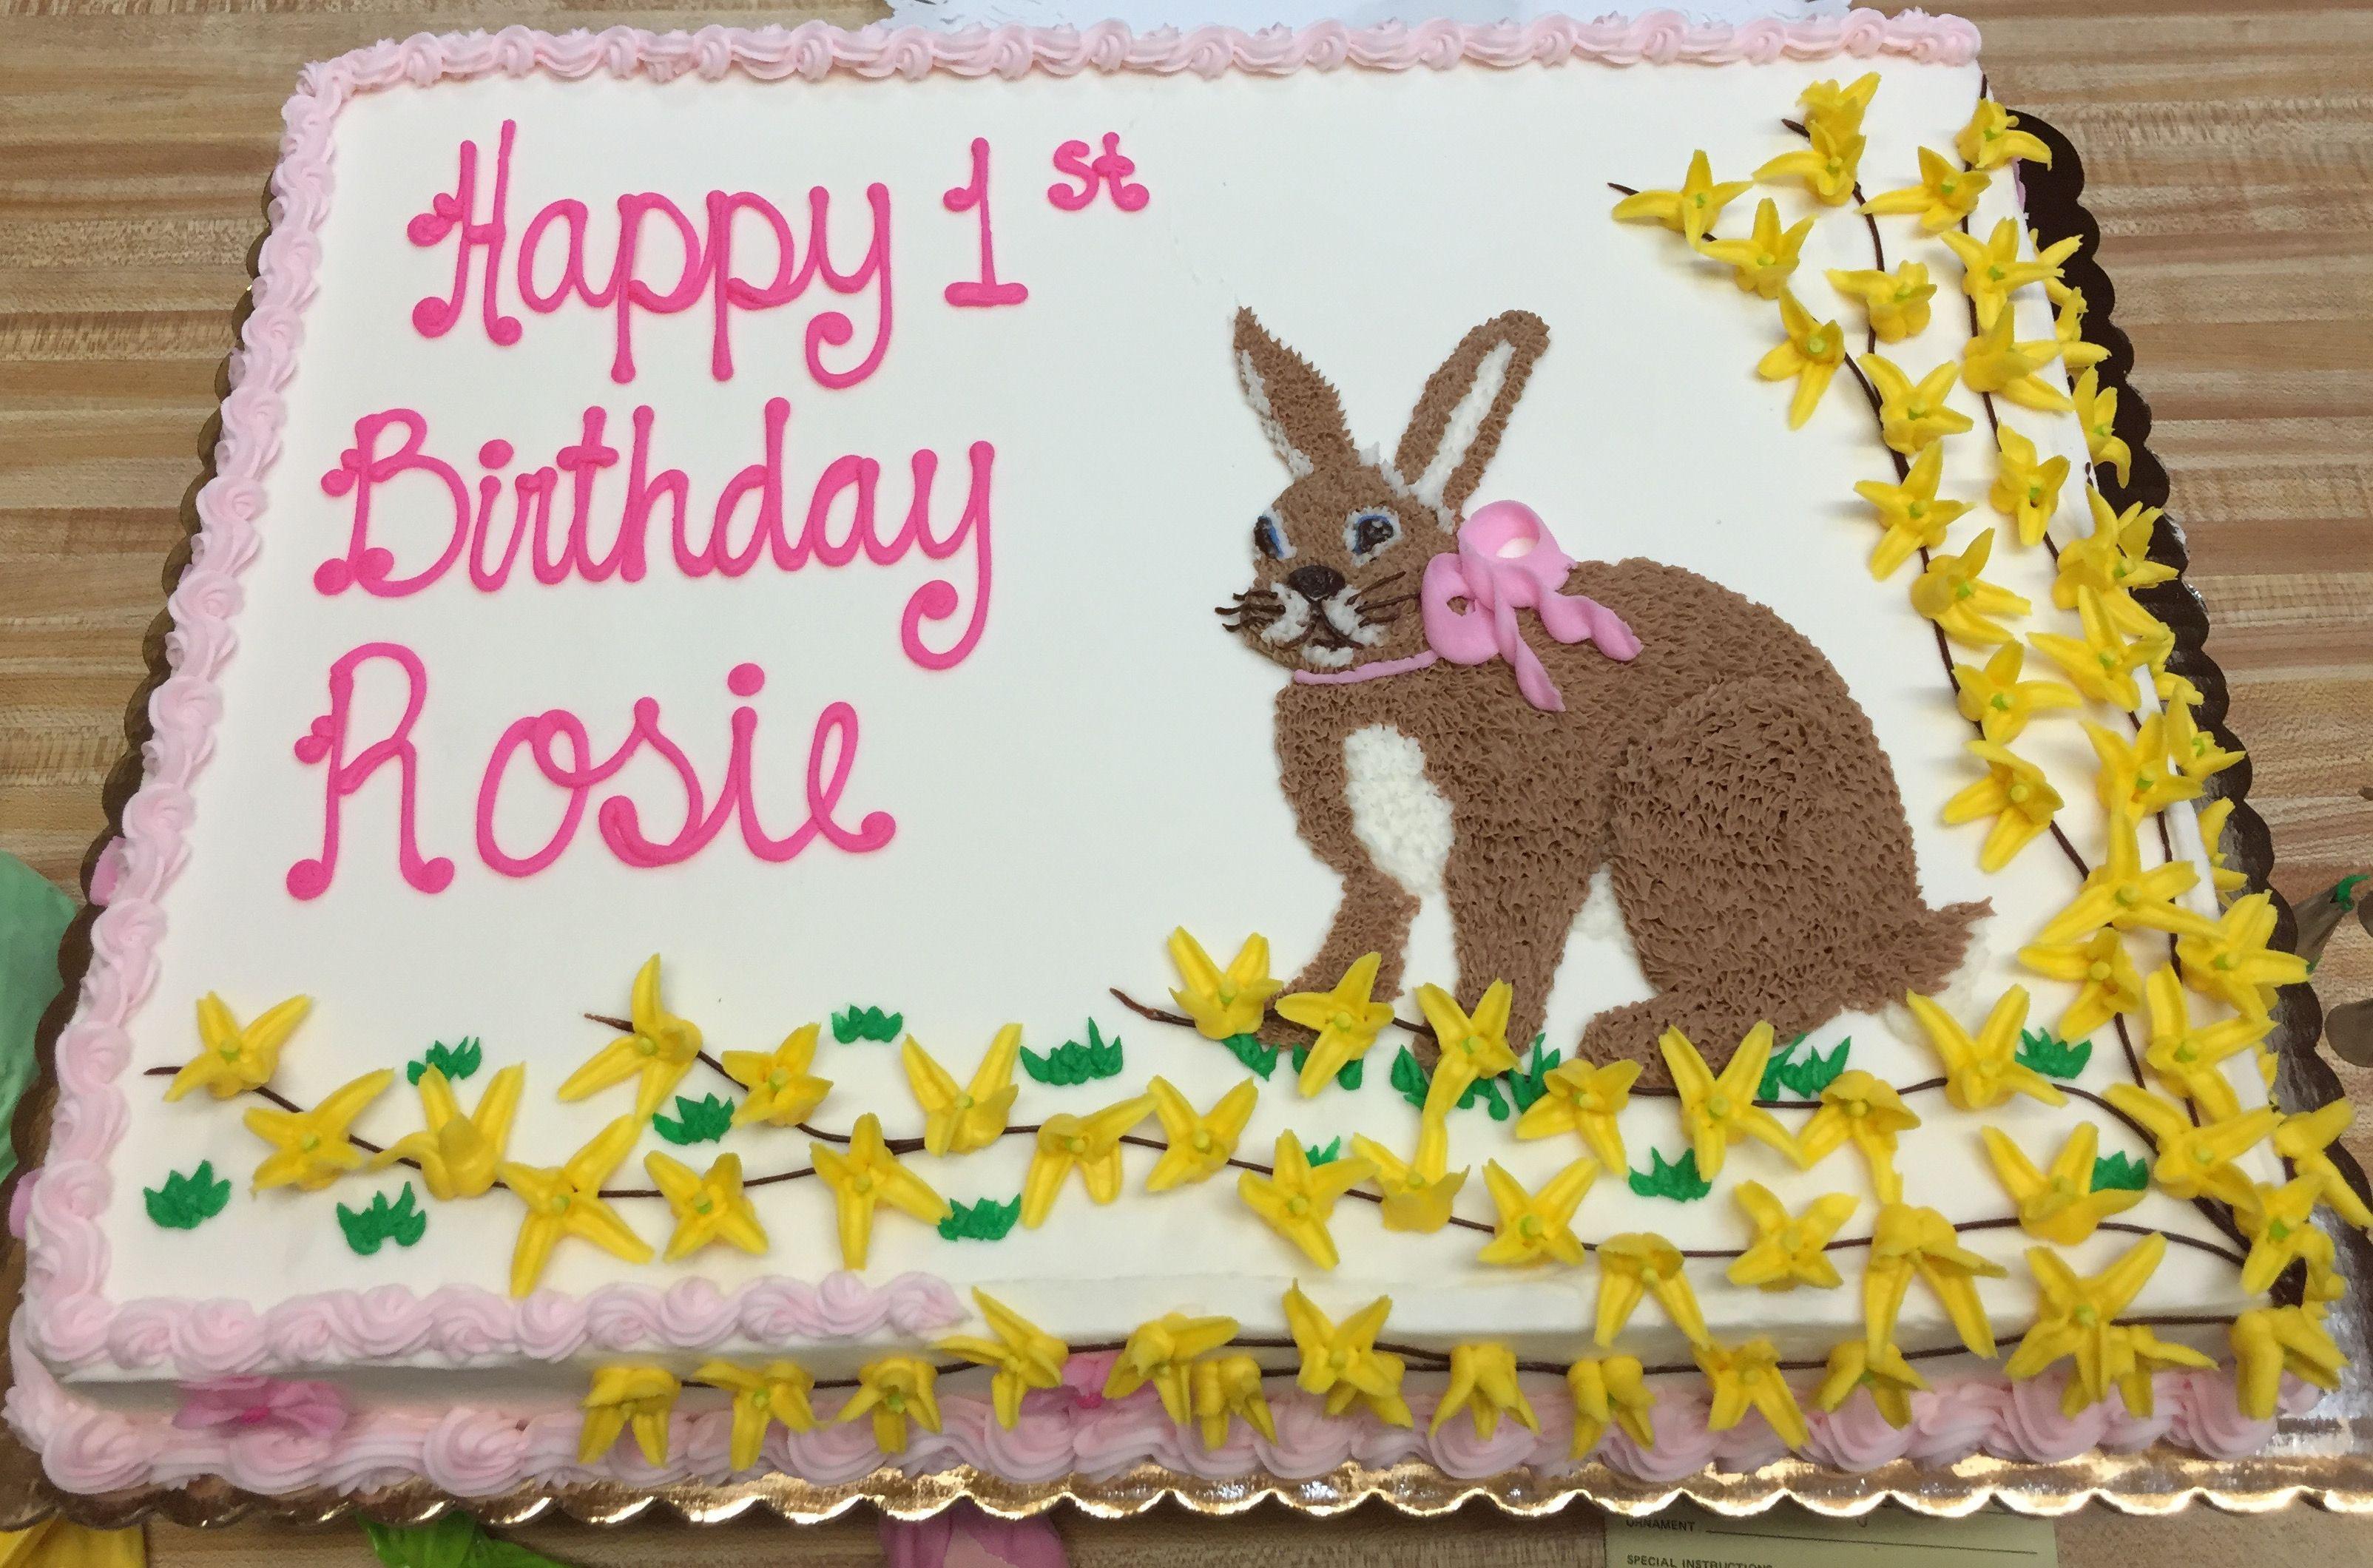 Birthday Cake With Rabbit Spring Theme Westhampton Pastry Shop Richmond VA